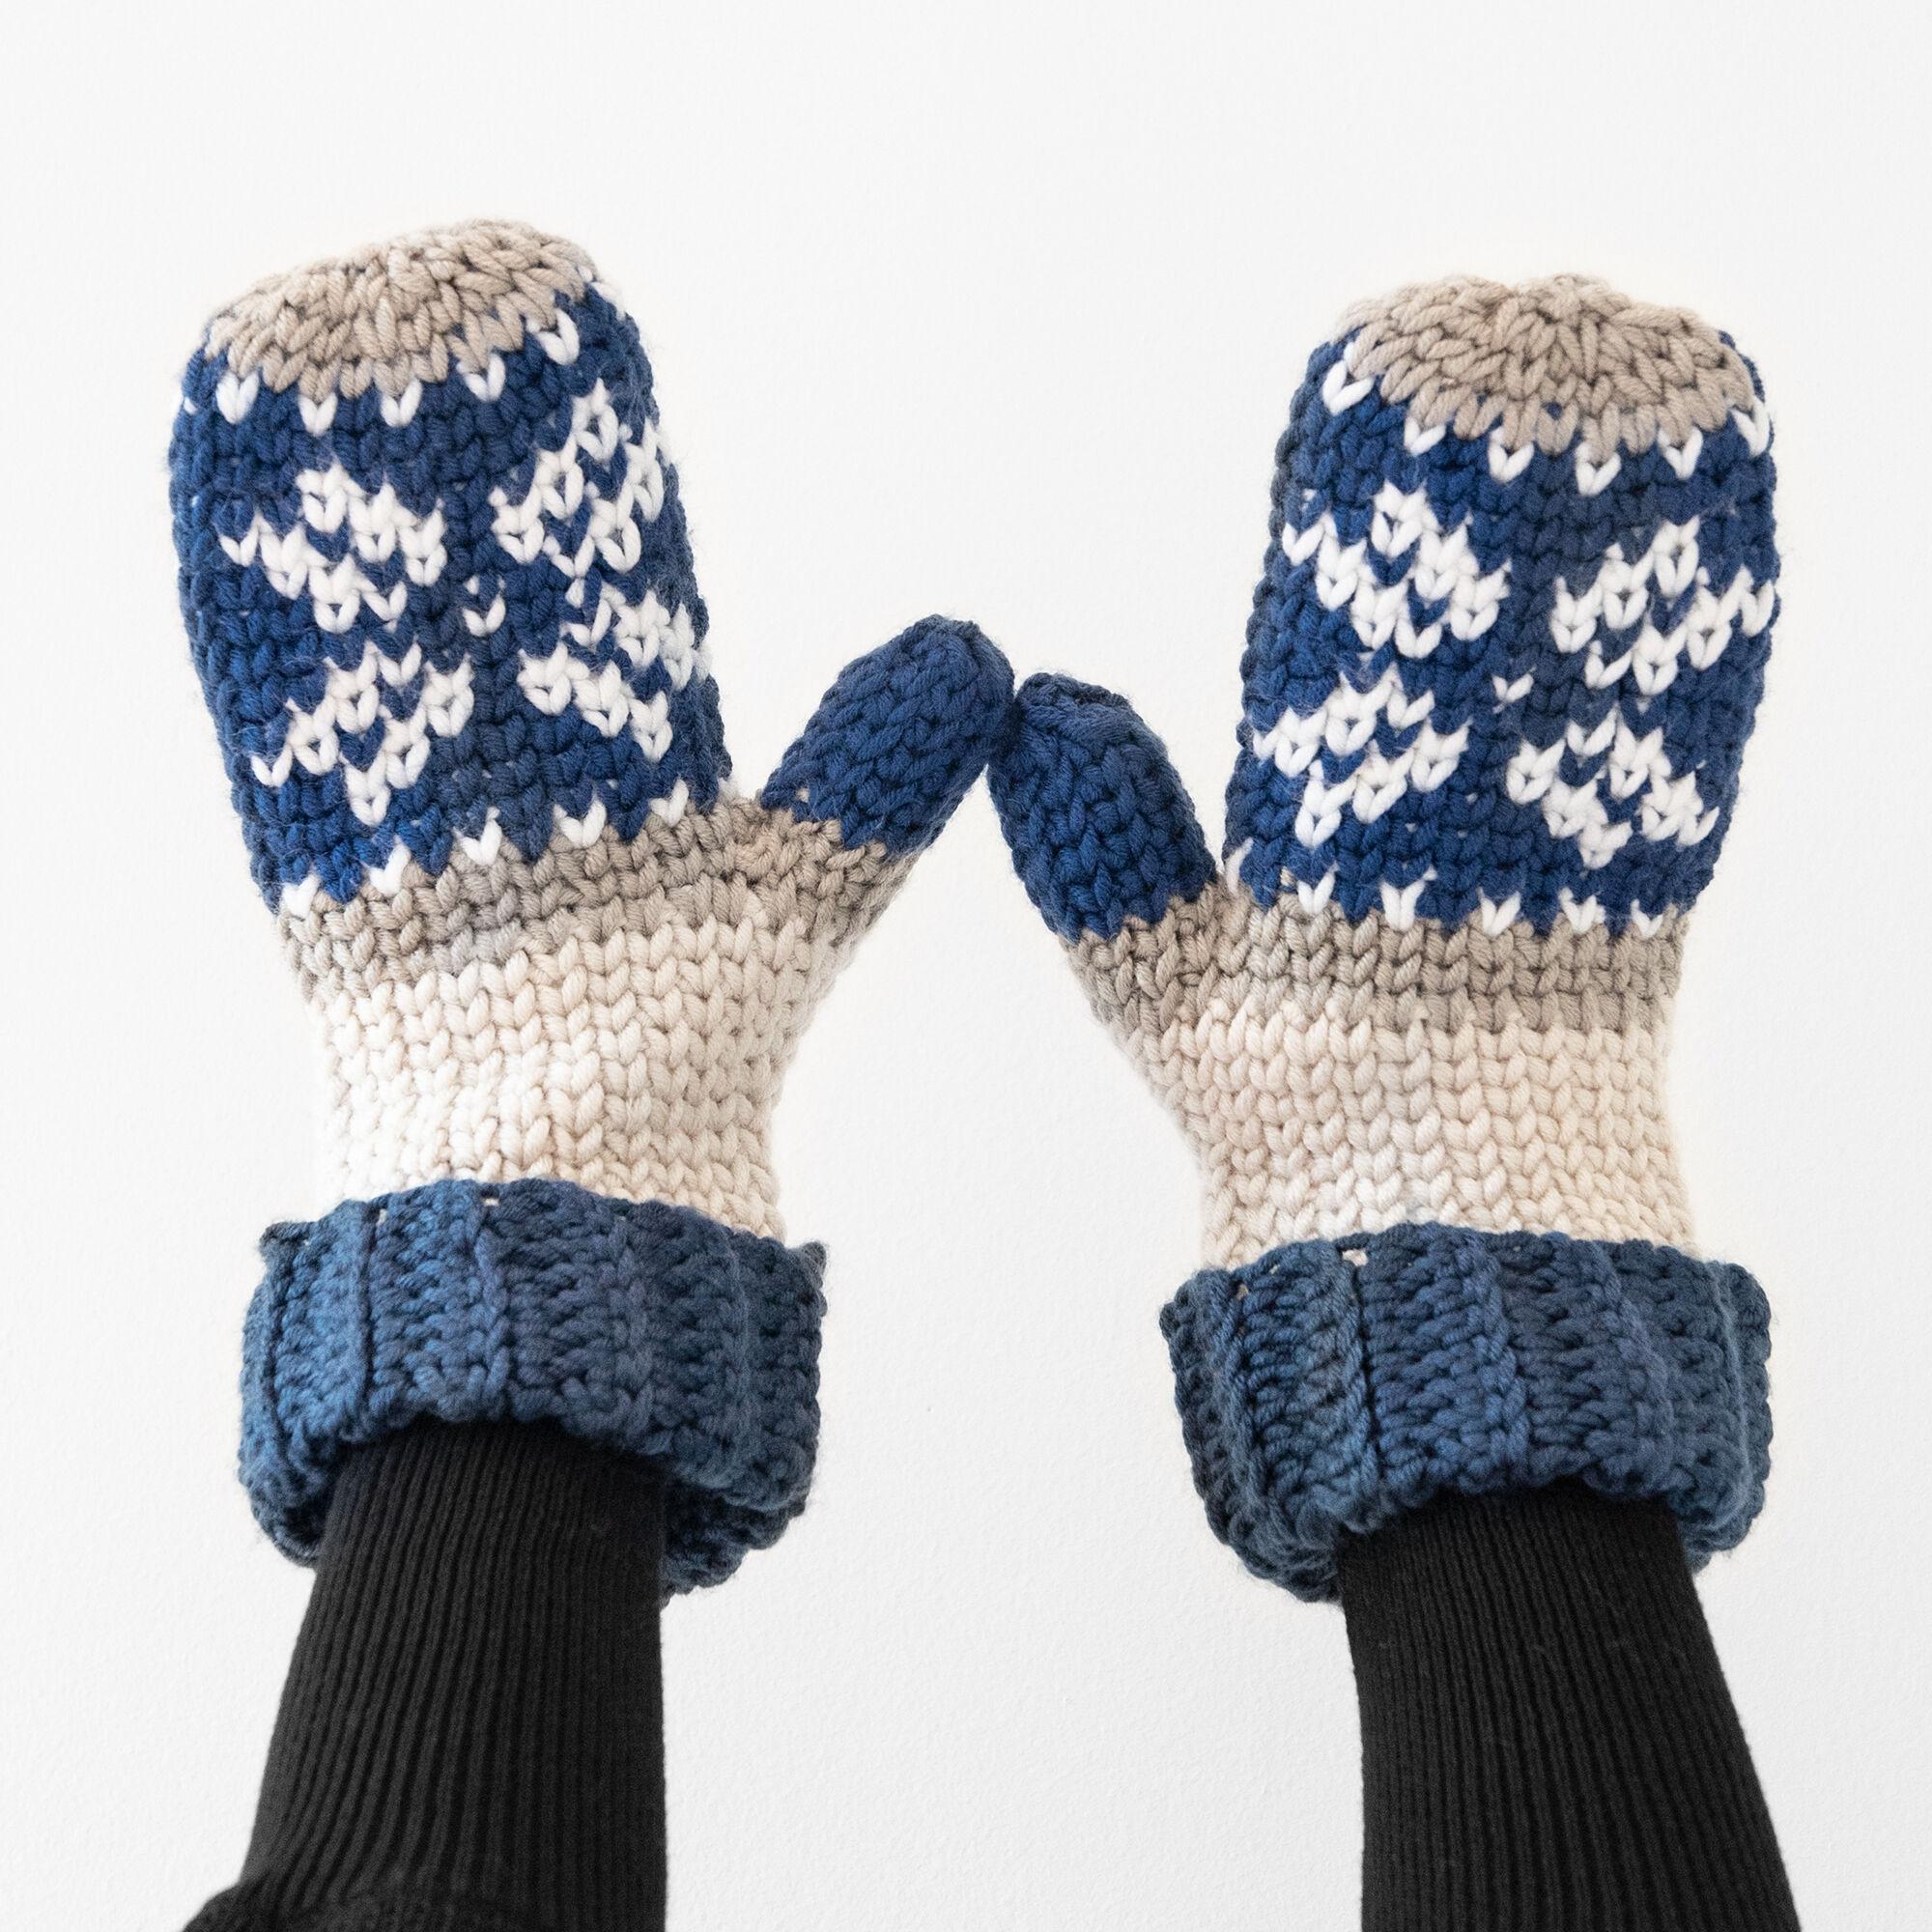 Caron x Pantone Fair Isle Crochet Mittens Pattern | Yarnspirations